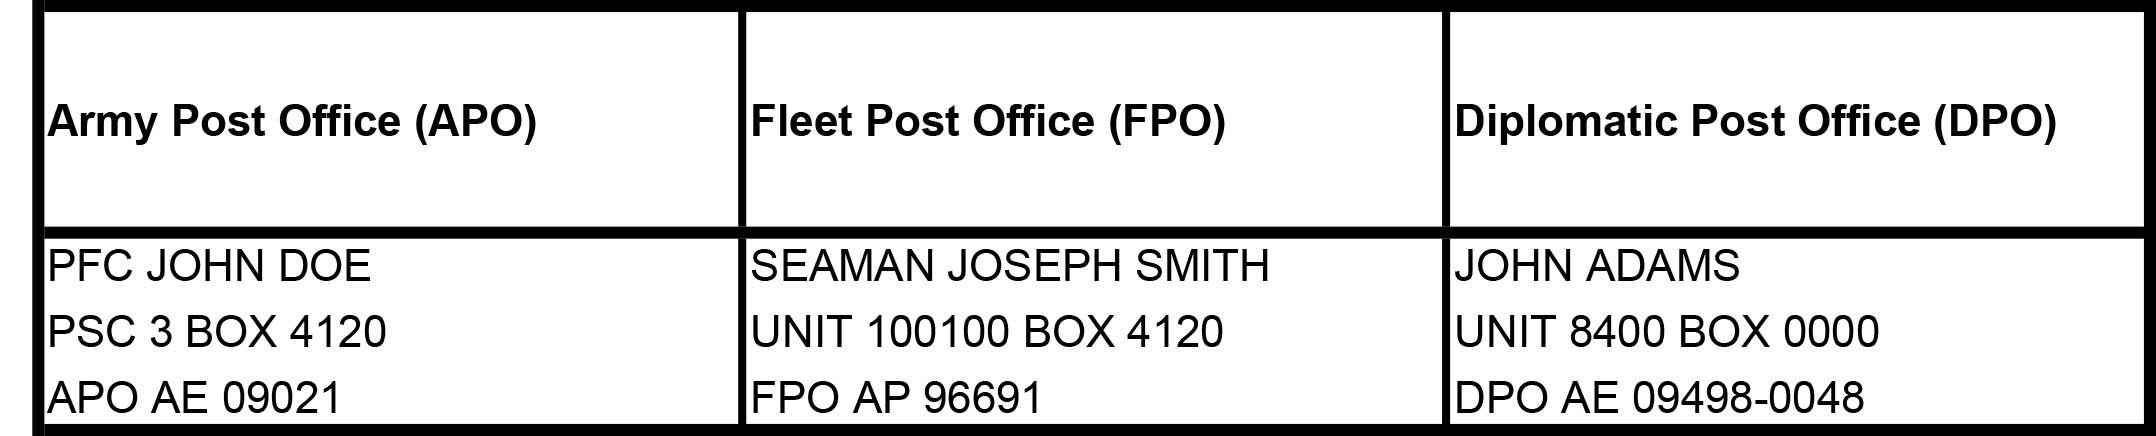 APO Shipping Address.jpg